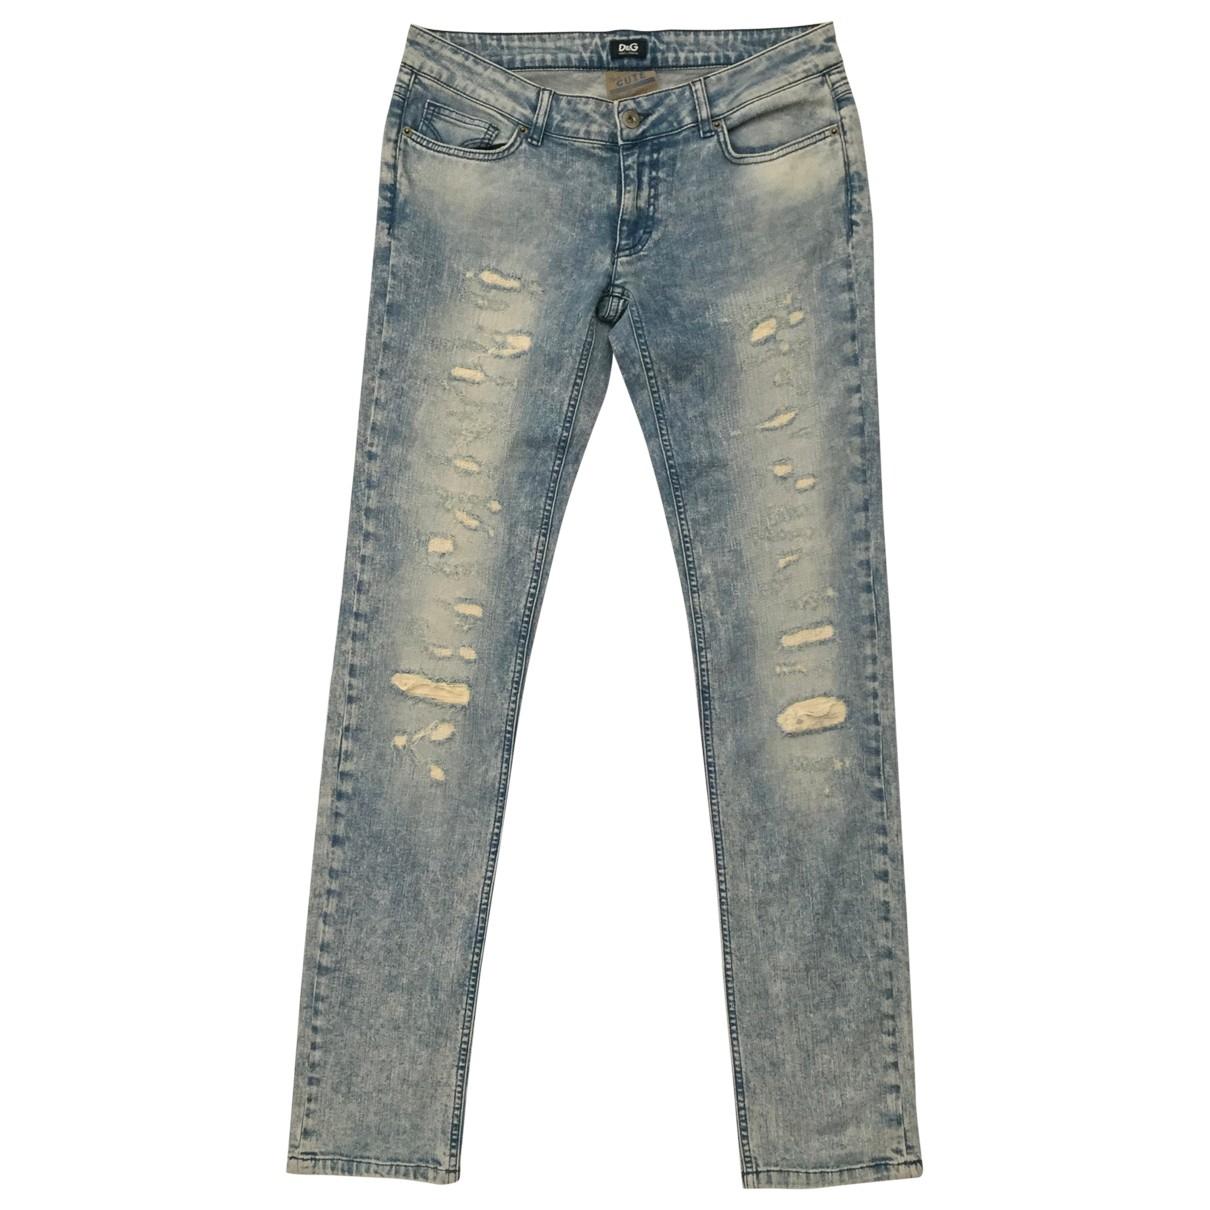 D&g \N Blue Cotton - elasthane Jeans for Women 30 US